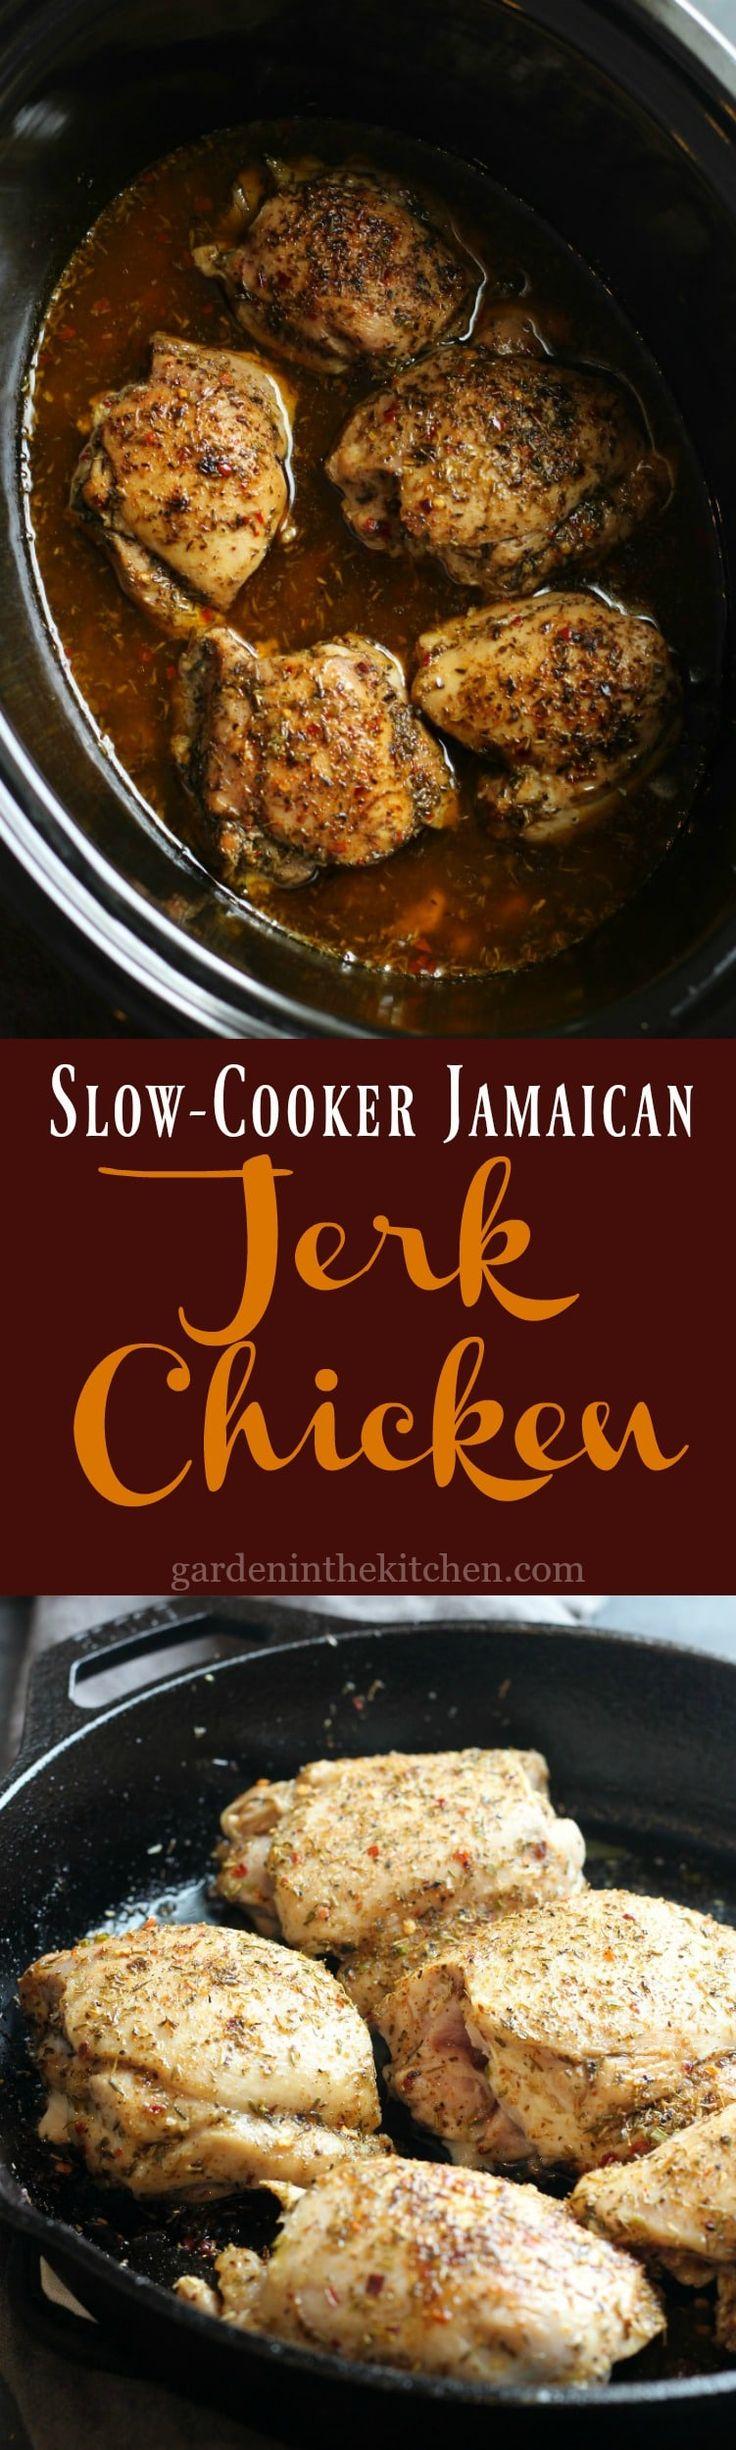 Slow Cooker Jamaican Jerk Chicken | gardeninthekitchen.com #jerkchicken #slowcookerchicken